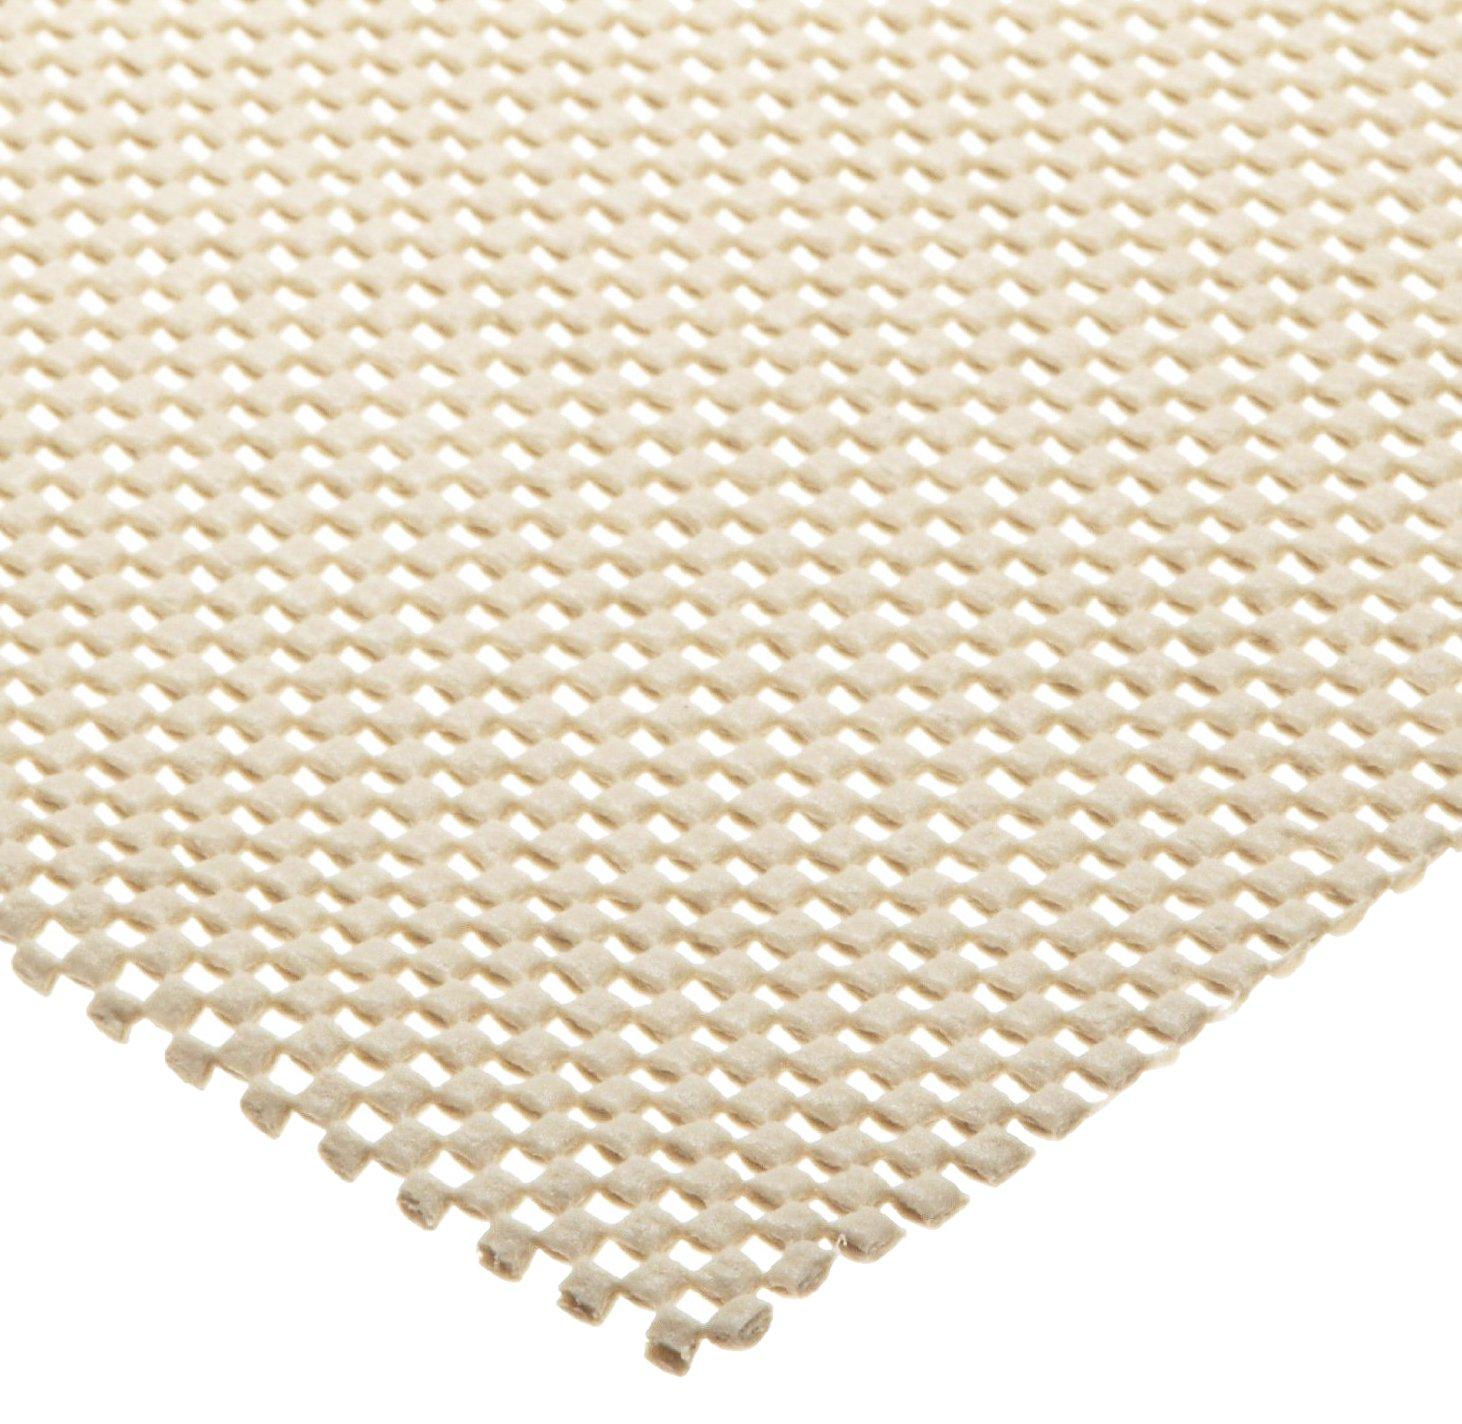 Tenura 75378-0002 Beige Fabric Non-Slip Netting, 6' Length x 20